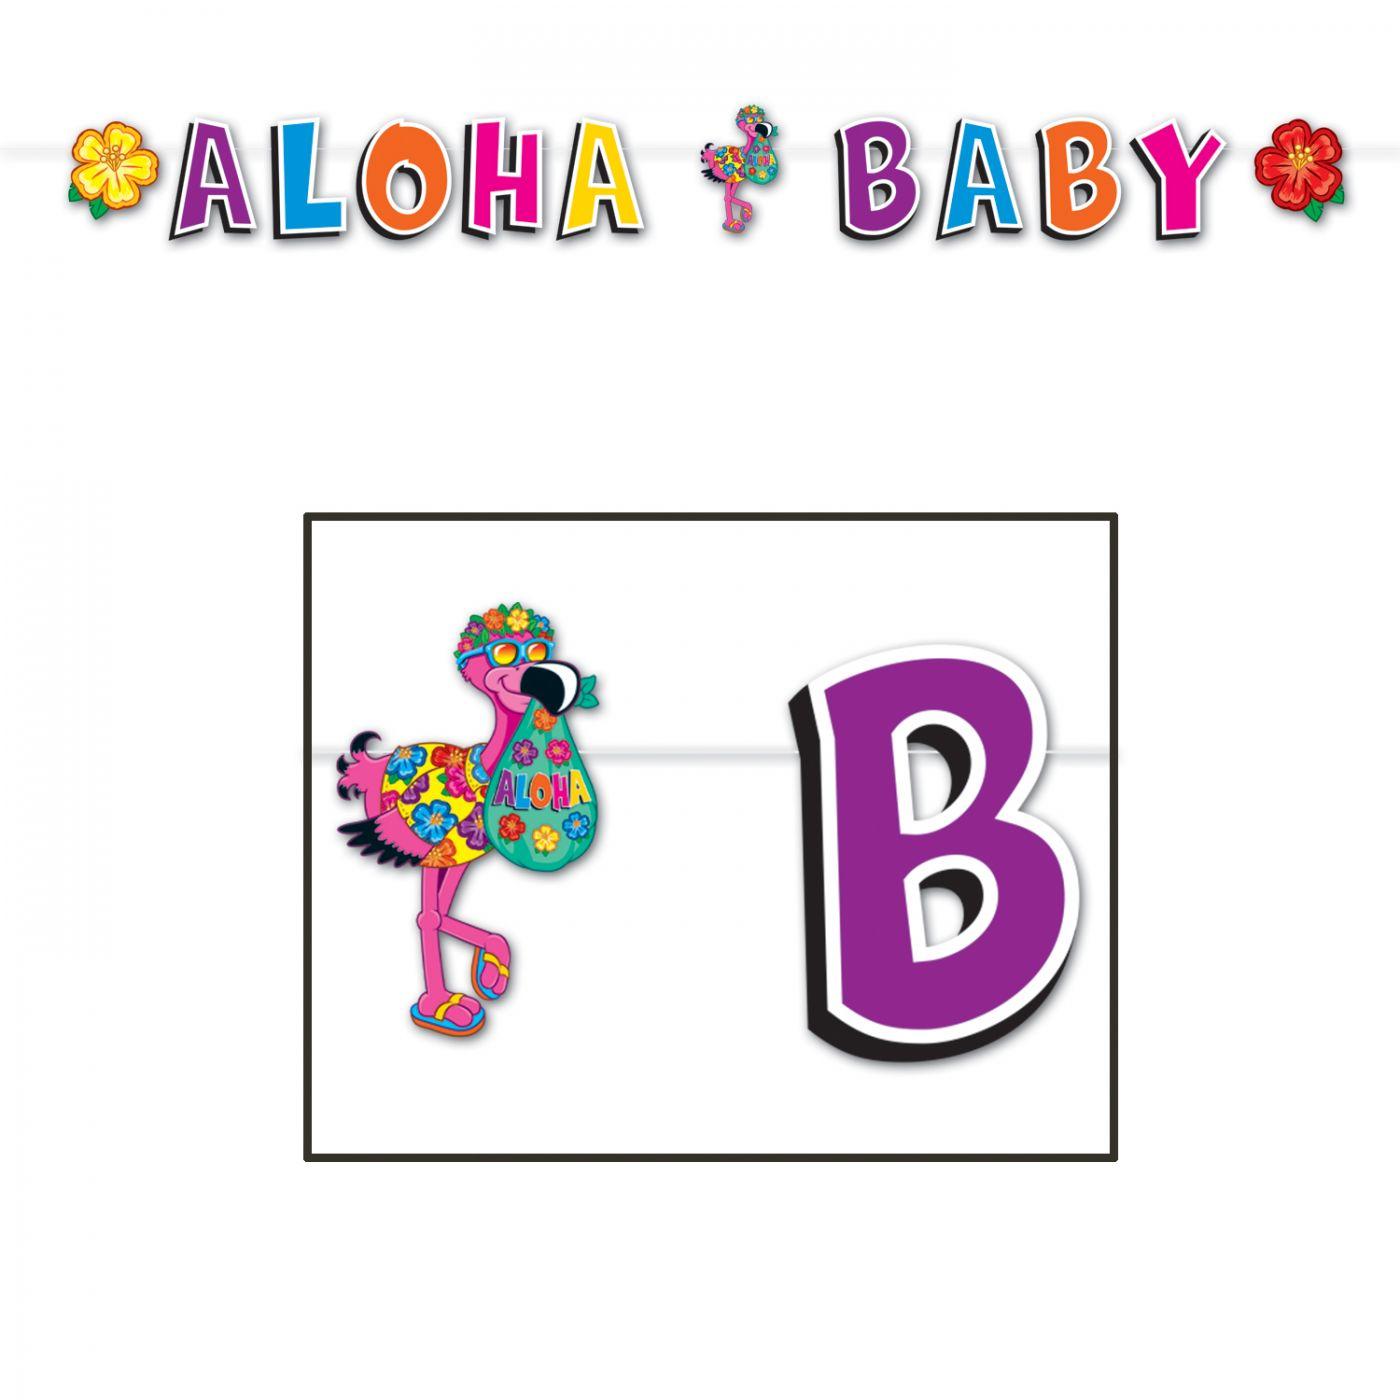 Hula Baby Streamer image